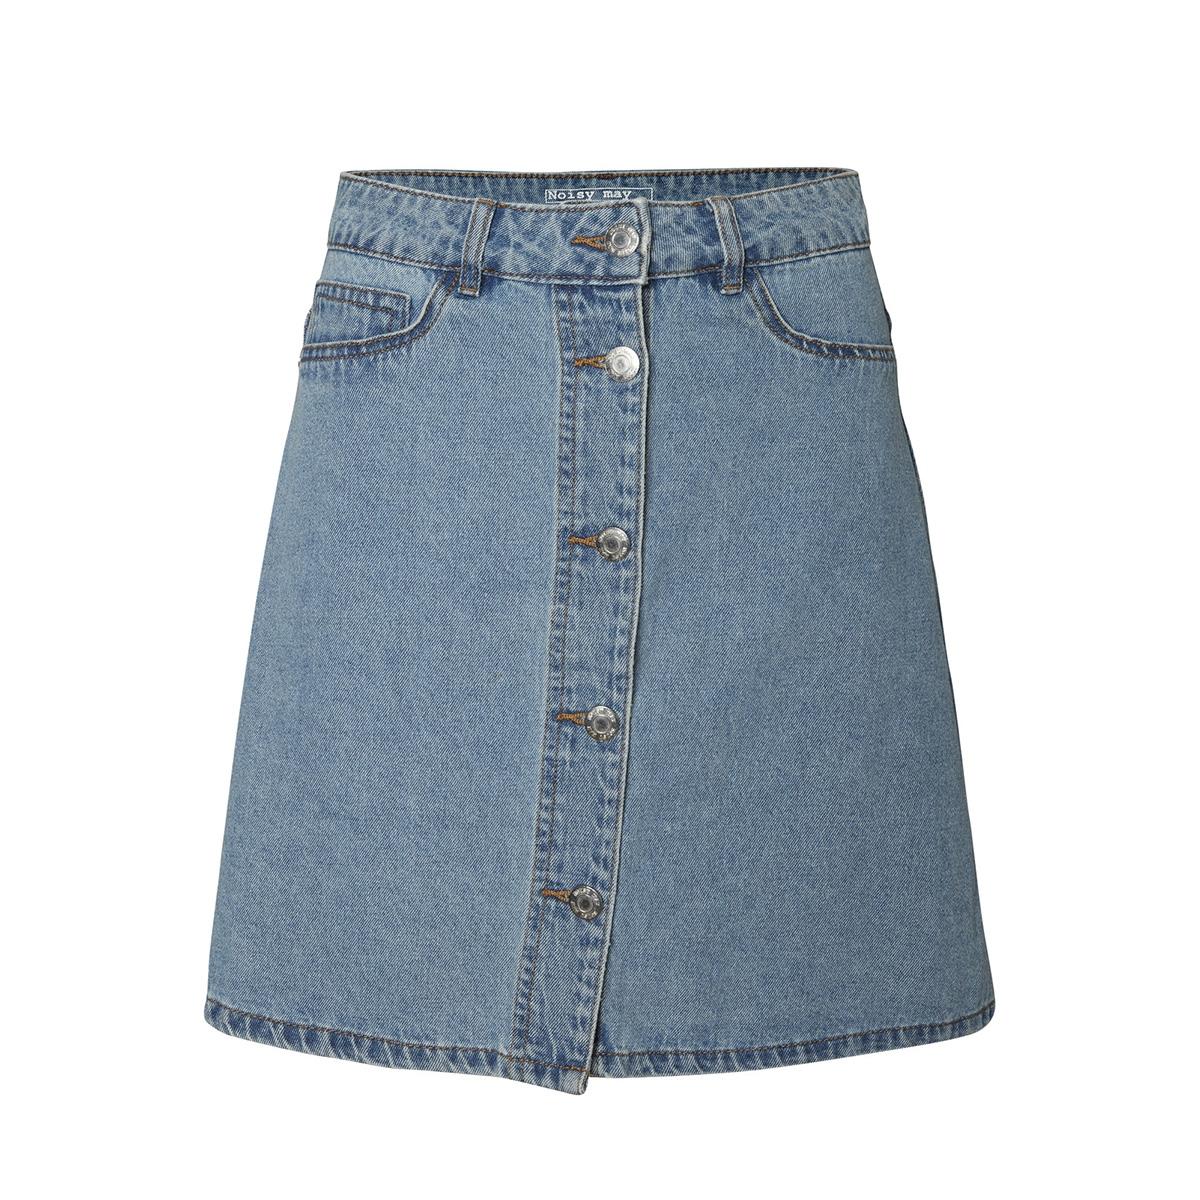 nmsunny shortdnm skater skirt gu124 noos 27001259 noisy may rok light blue denim